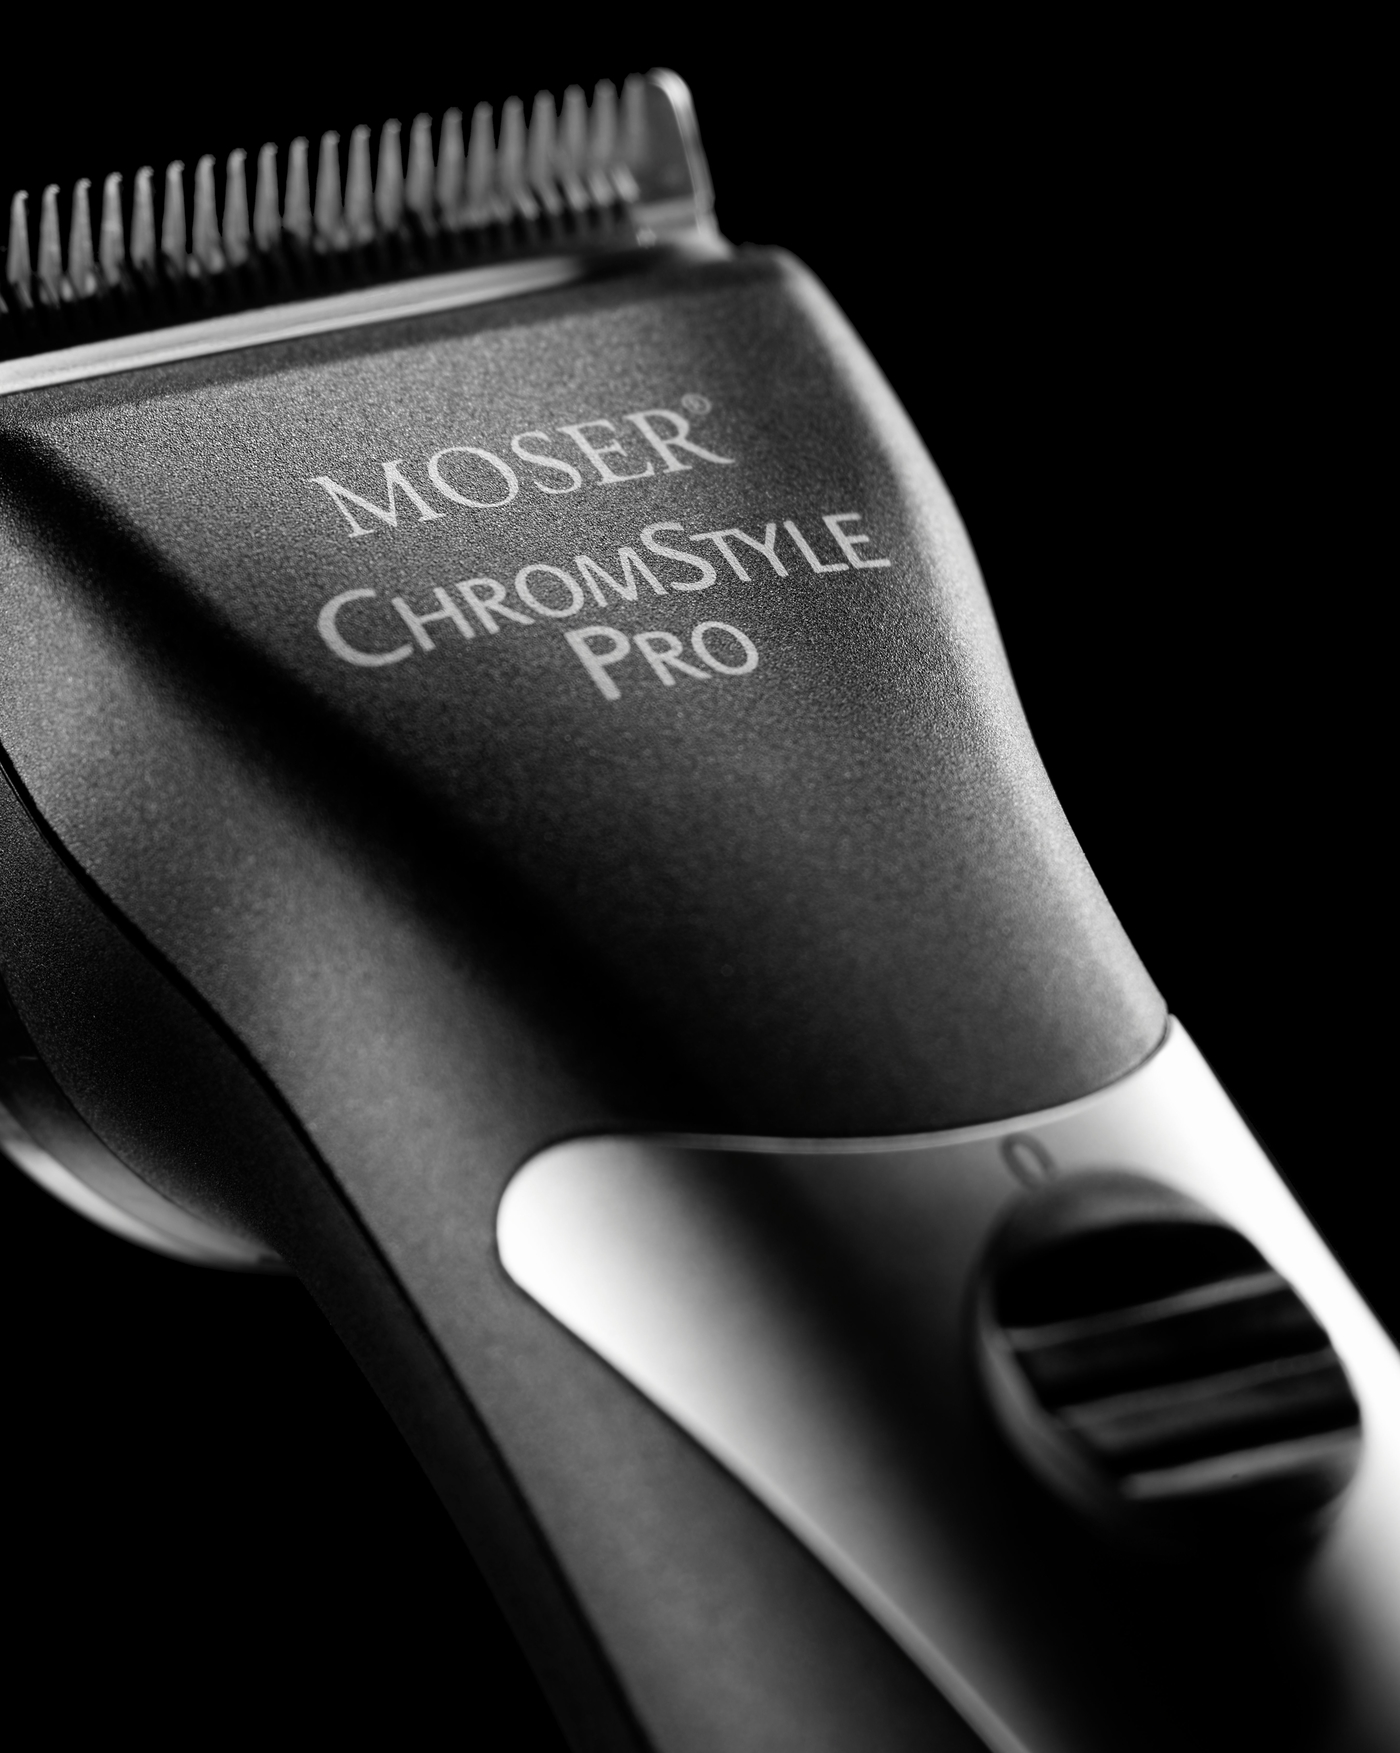 MOSER Chrom Style Pro 2